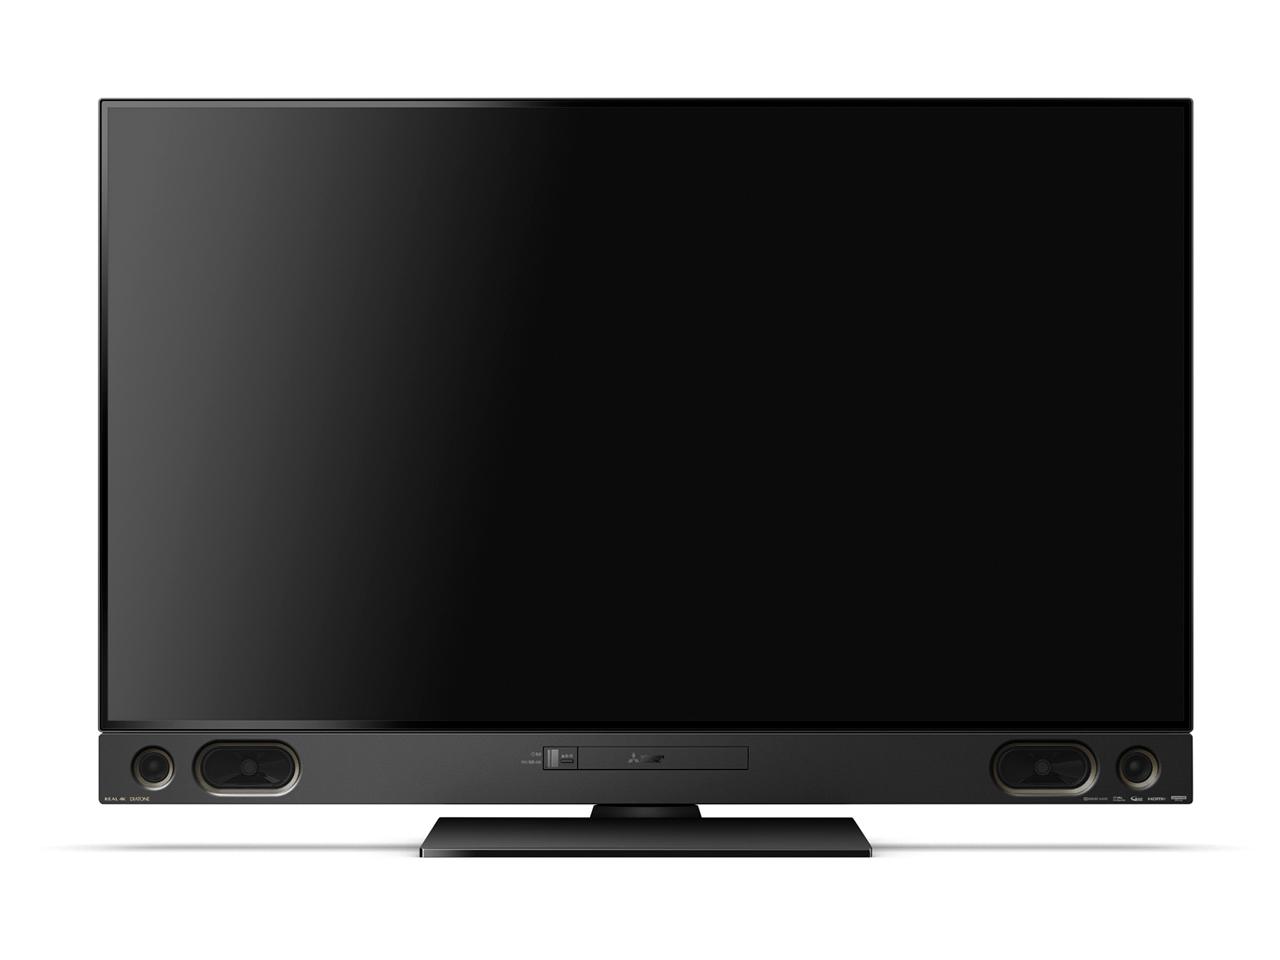 REAL LCD-A58RA1000 [58インチ] の製品画像